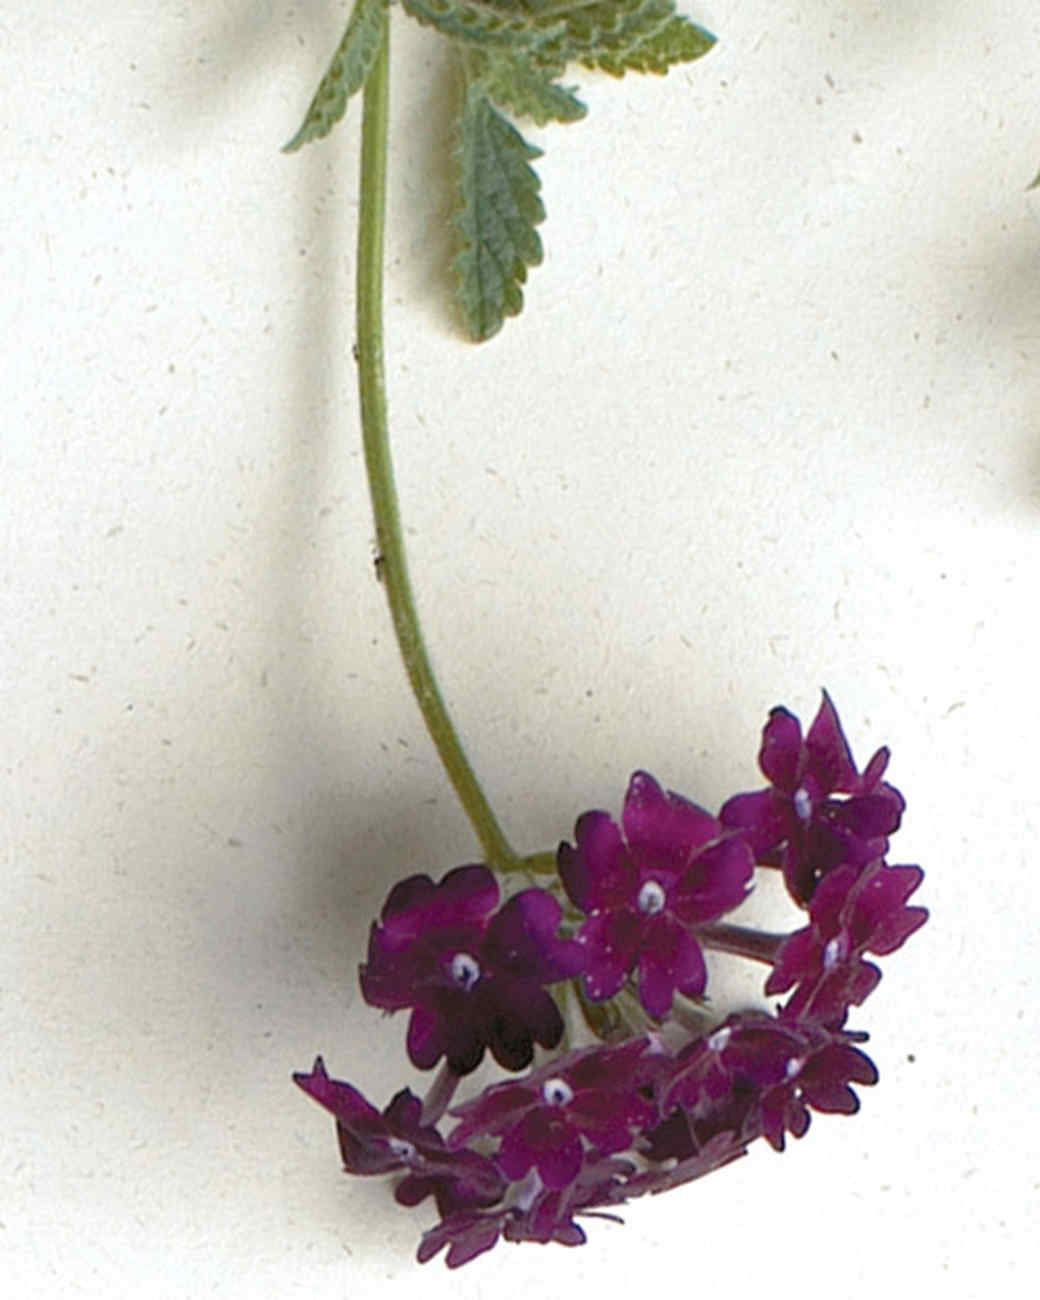 mld104318_0609_lanai_deep_purple.jpg